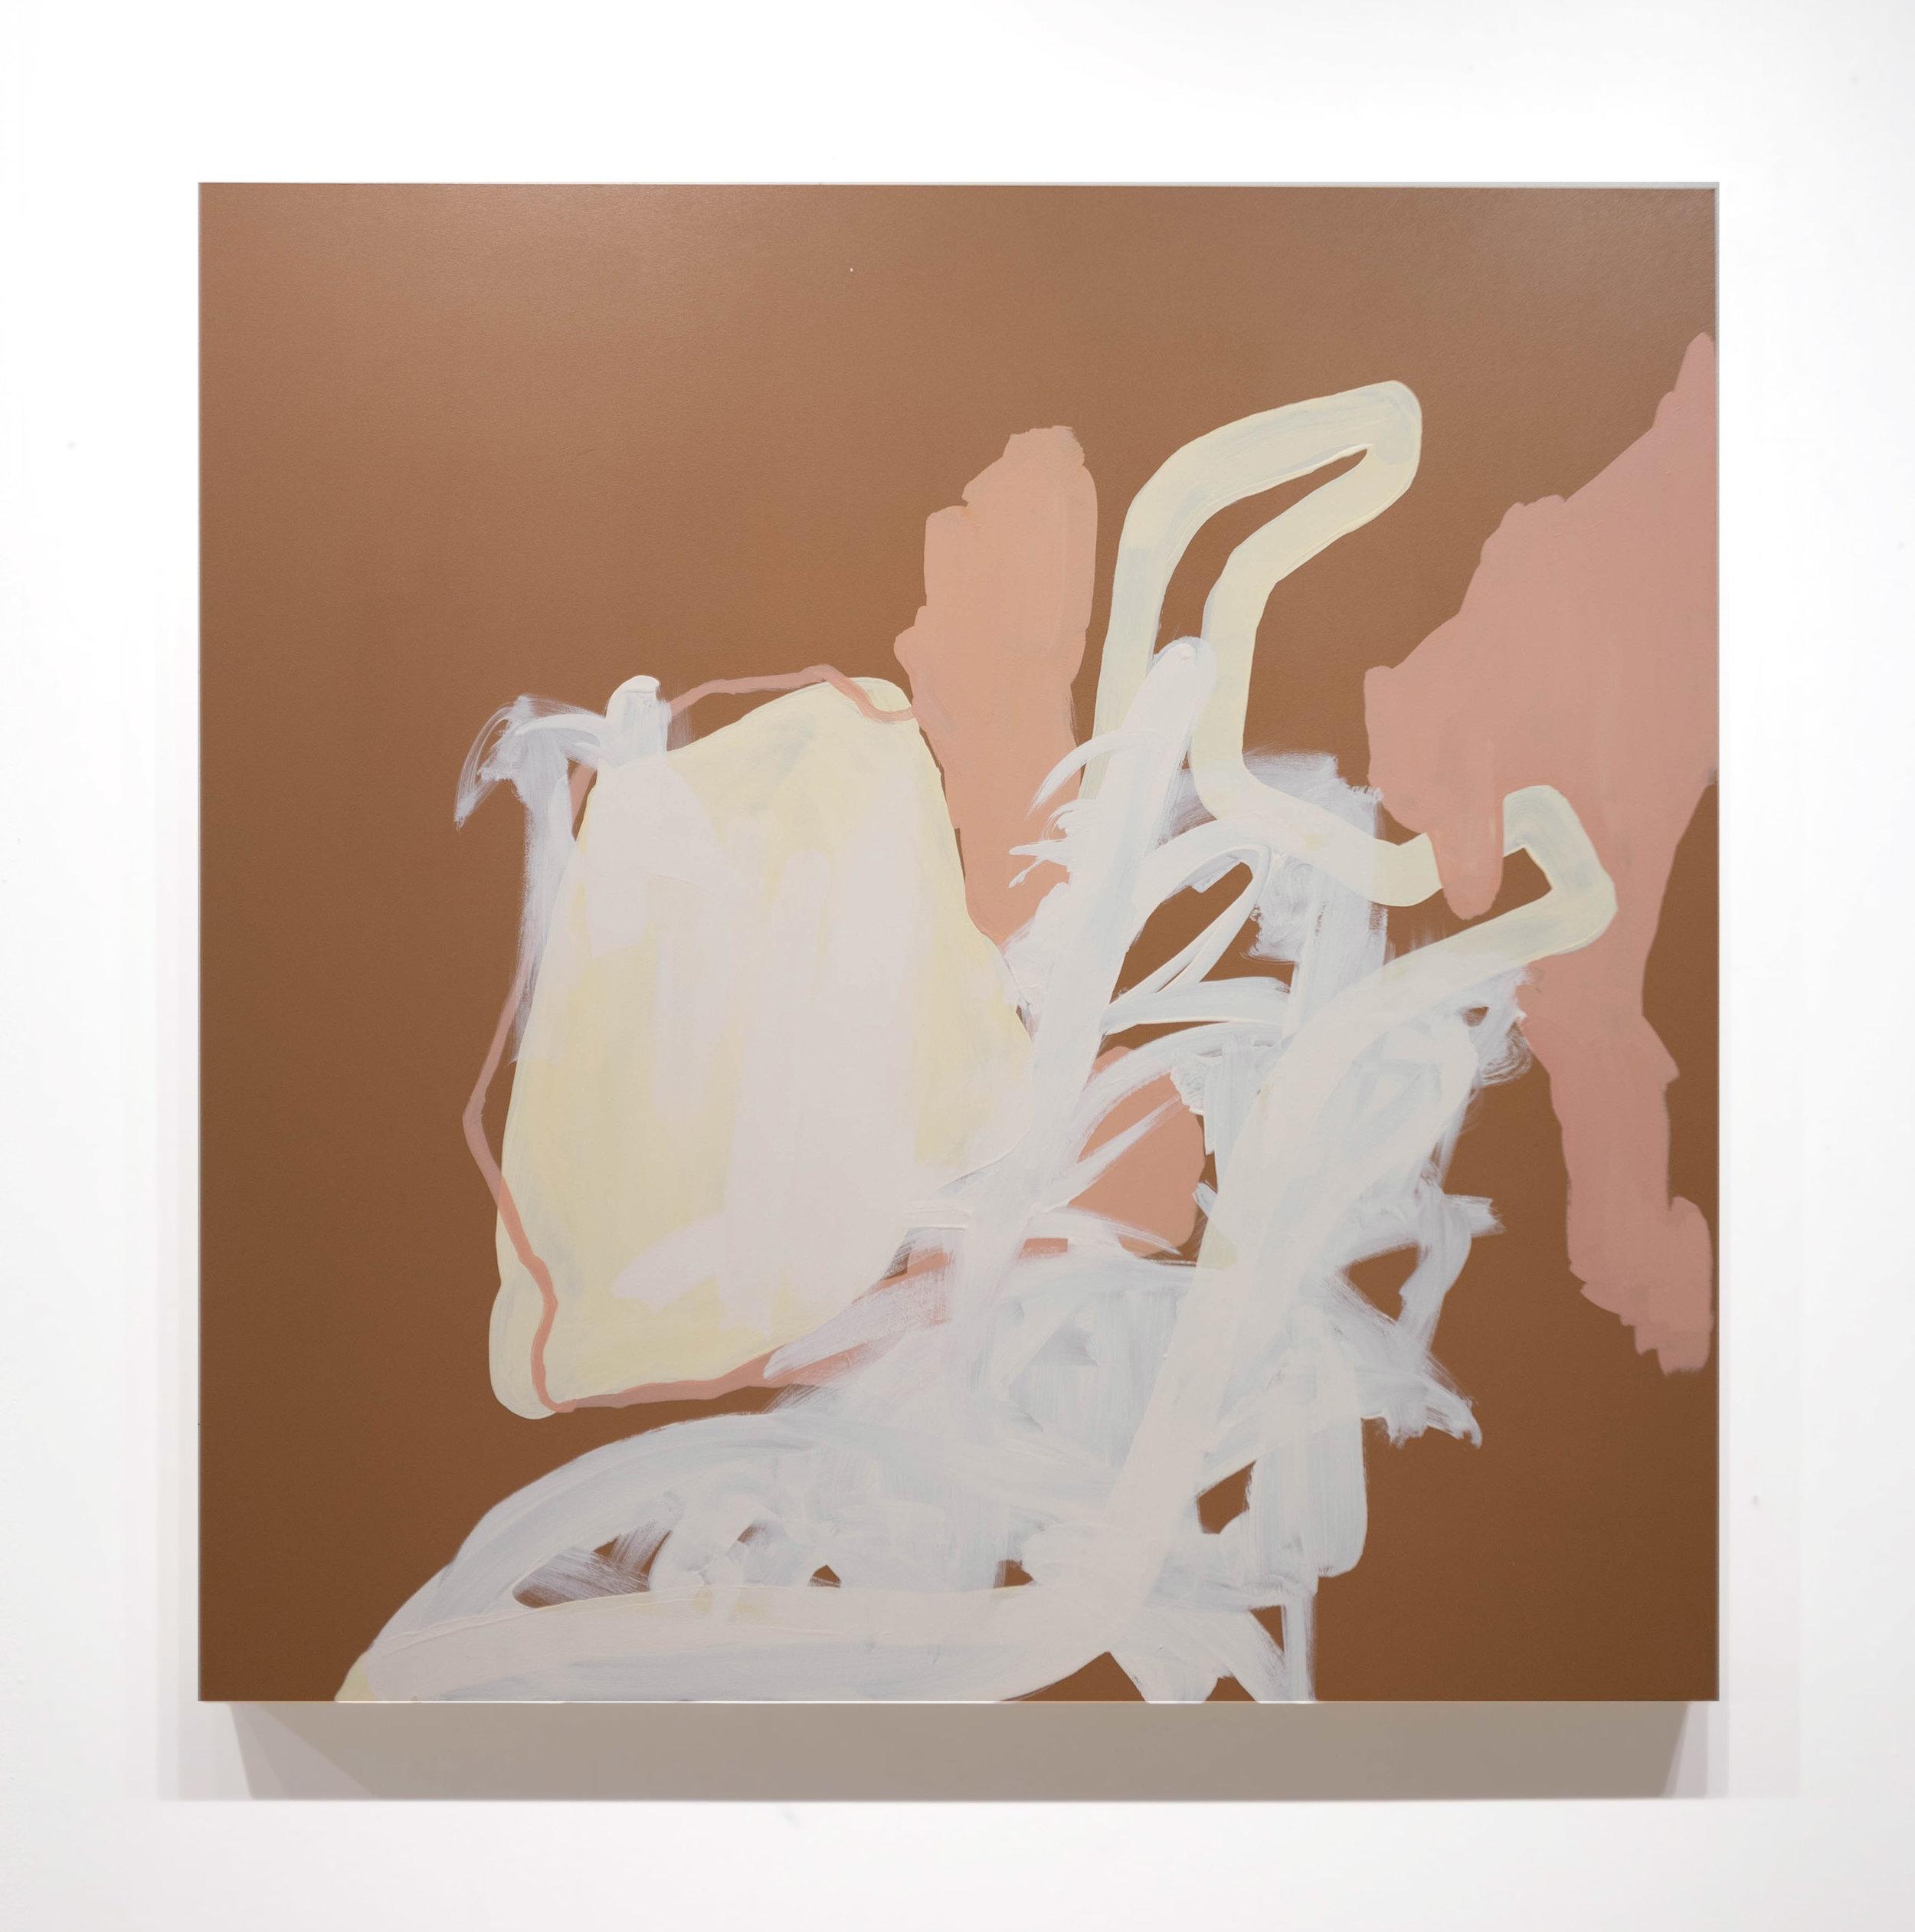 "Tell Me You Need Me,  2019. acrylic on panel, 36 x 36"" (91.44 x 91.44 cm)."